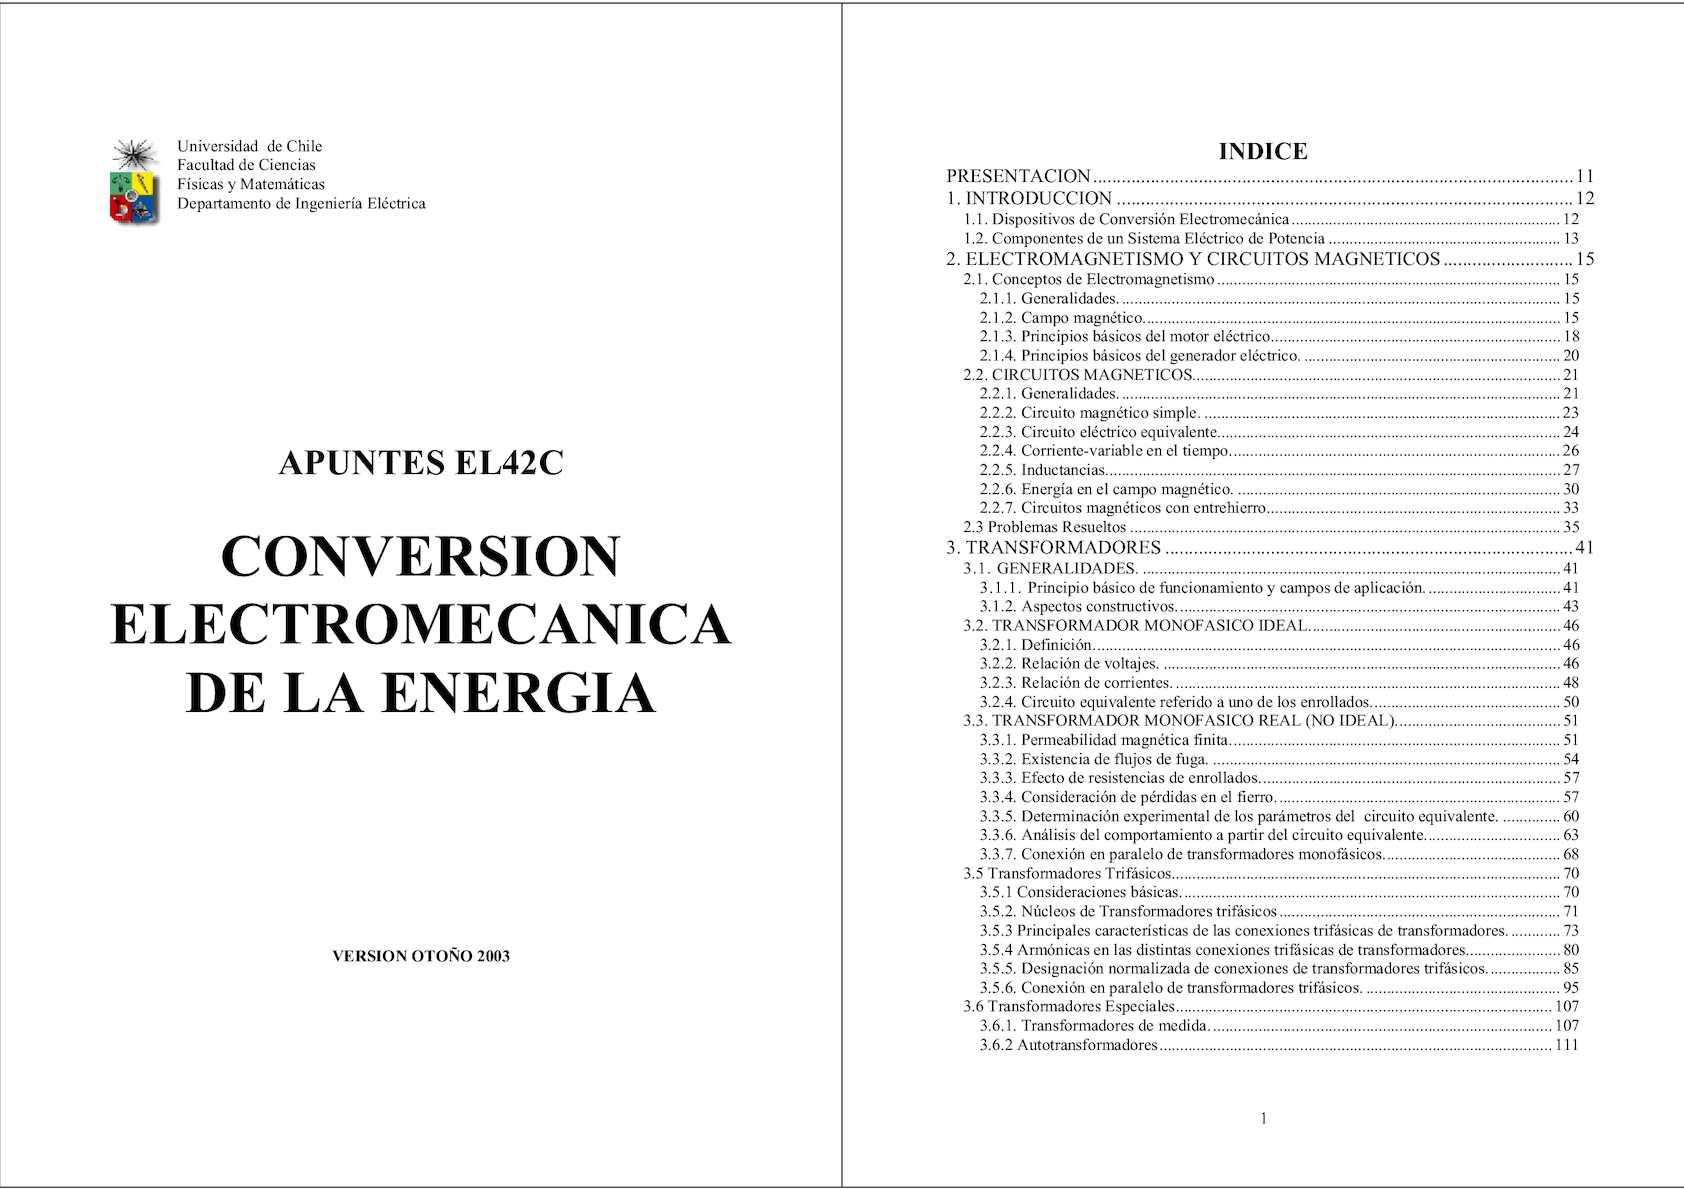 Circuito Unilineal : Calaméo conversion electromecanica de la energia vaf